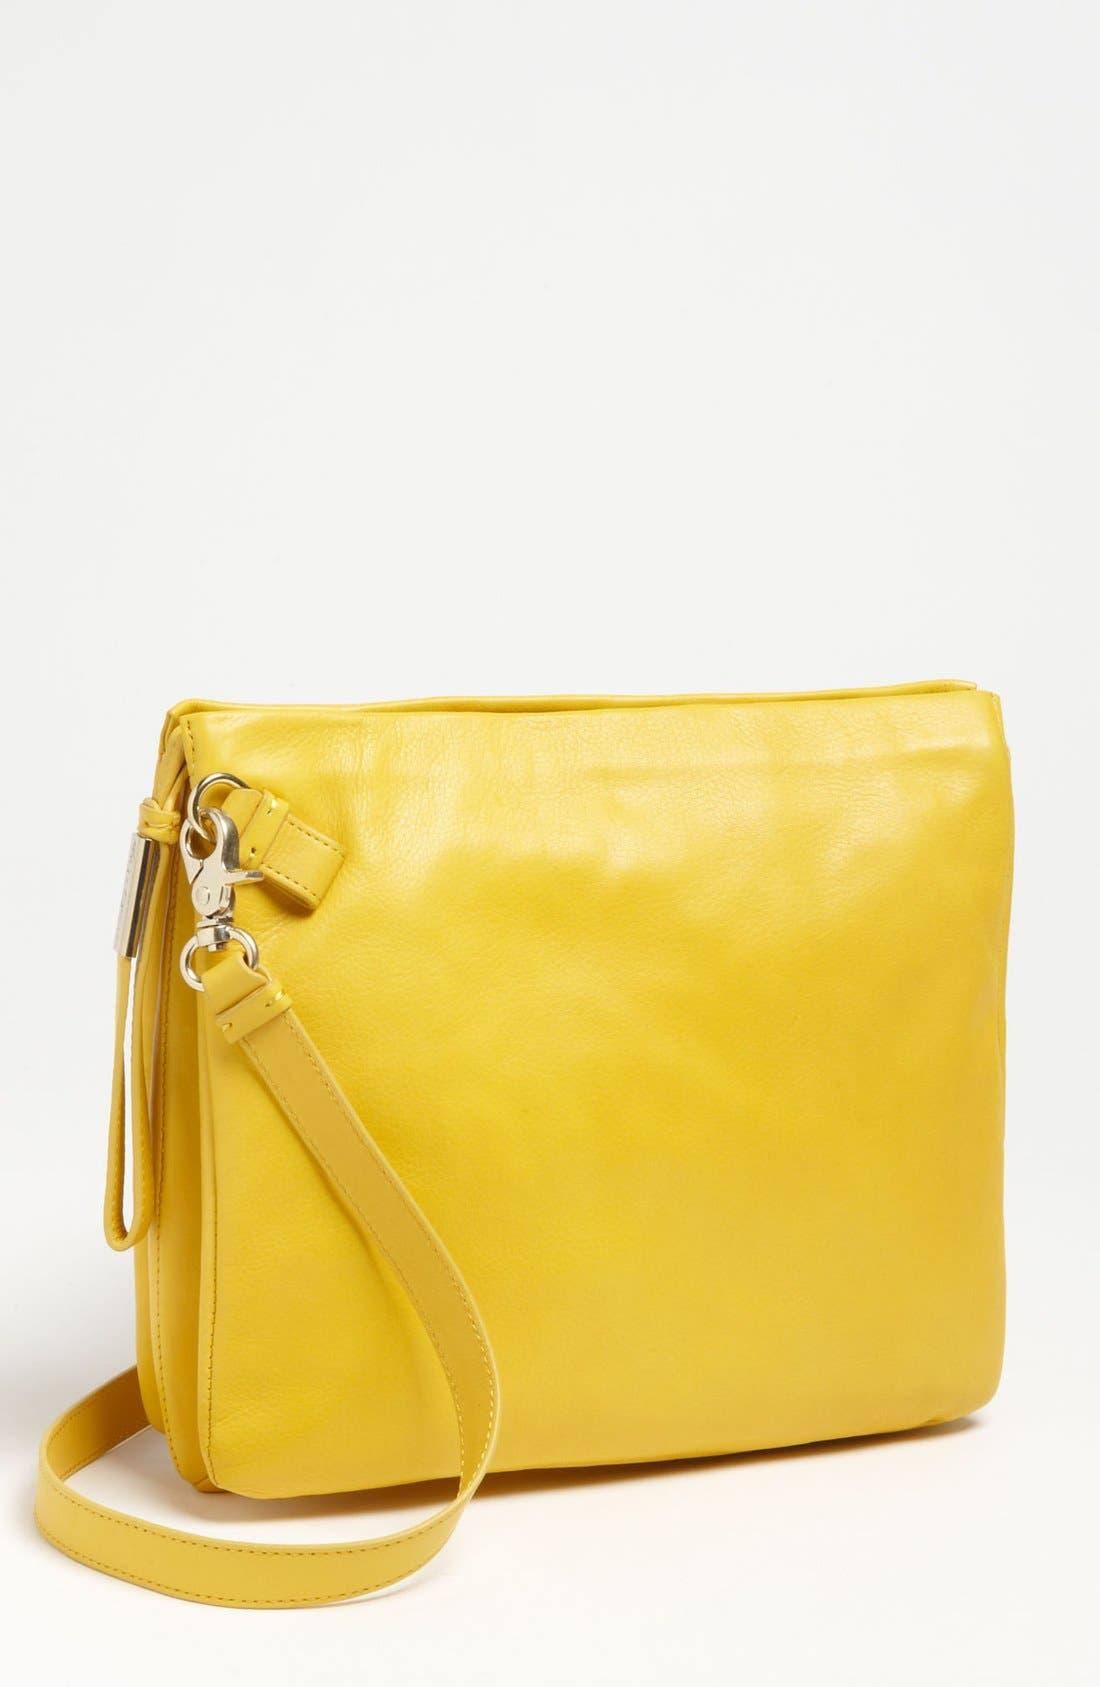 Alternate Image 1 Selected - Foley + Corinna 'iPad Cache' Leather Crossbody Bag